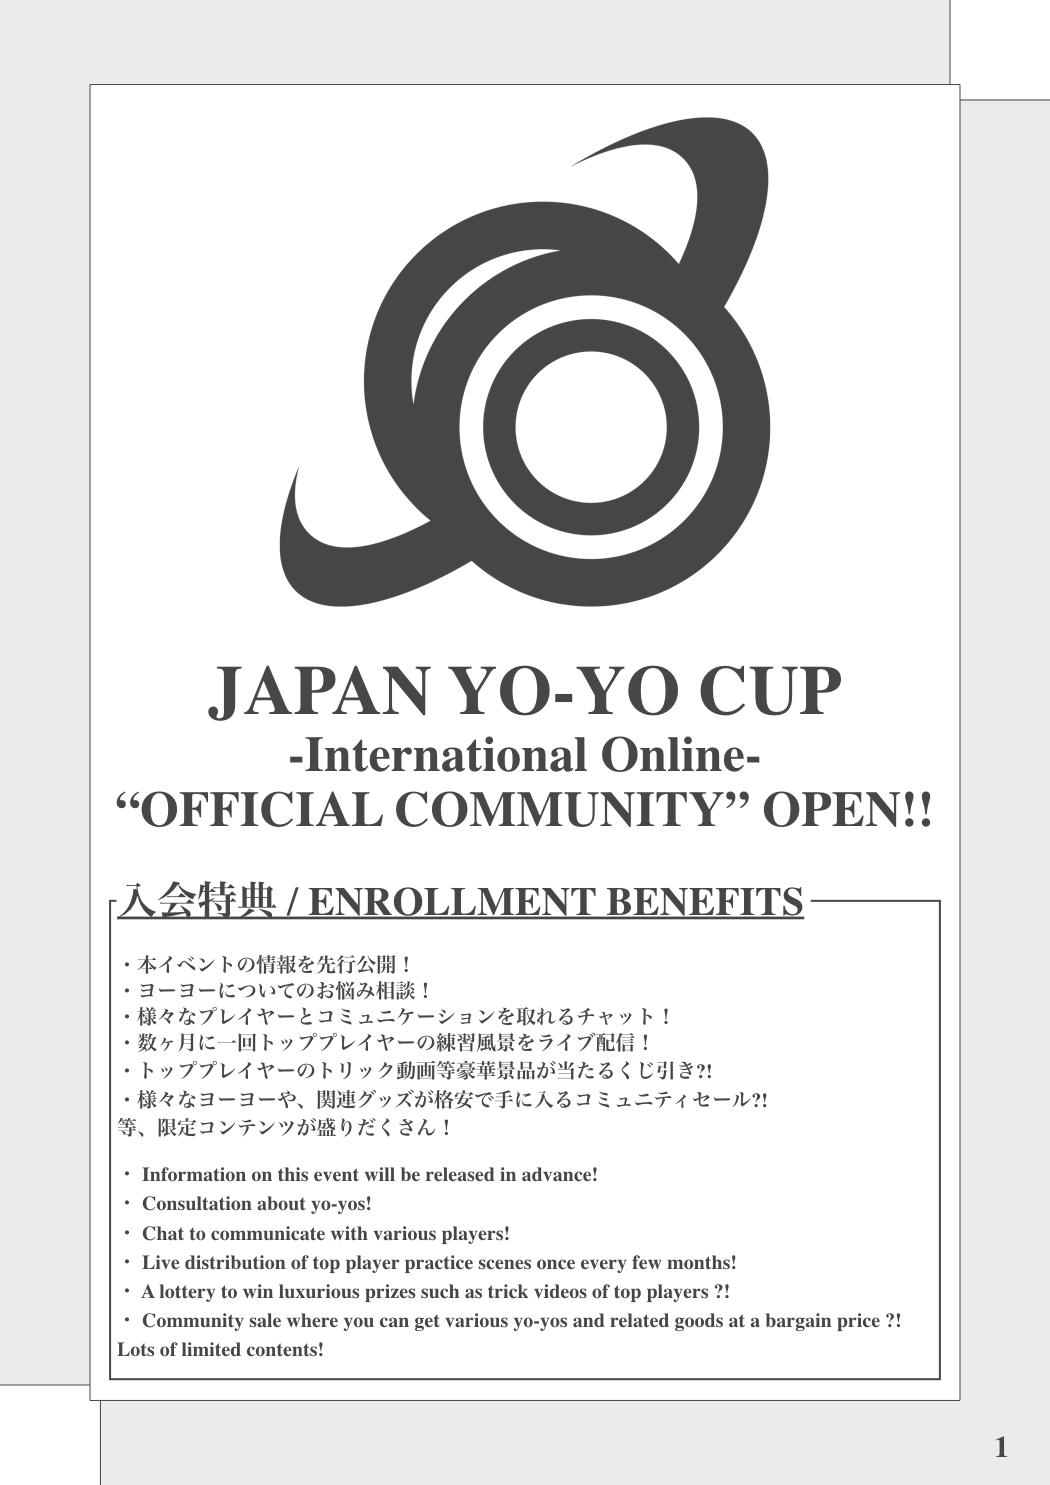 """JAPAN YO-YO CUP"" オフィシャルコミュニティ開設! / Official Community Open!"